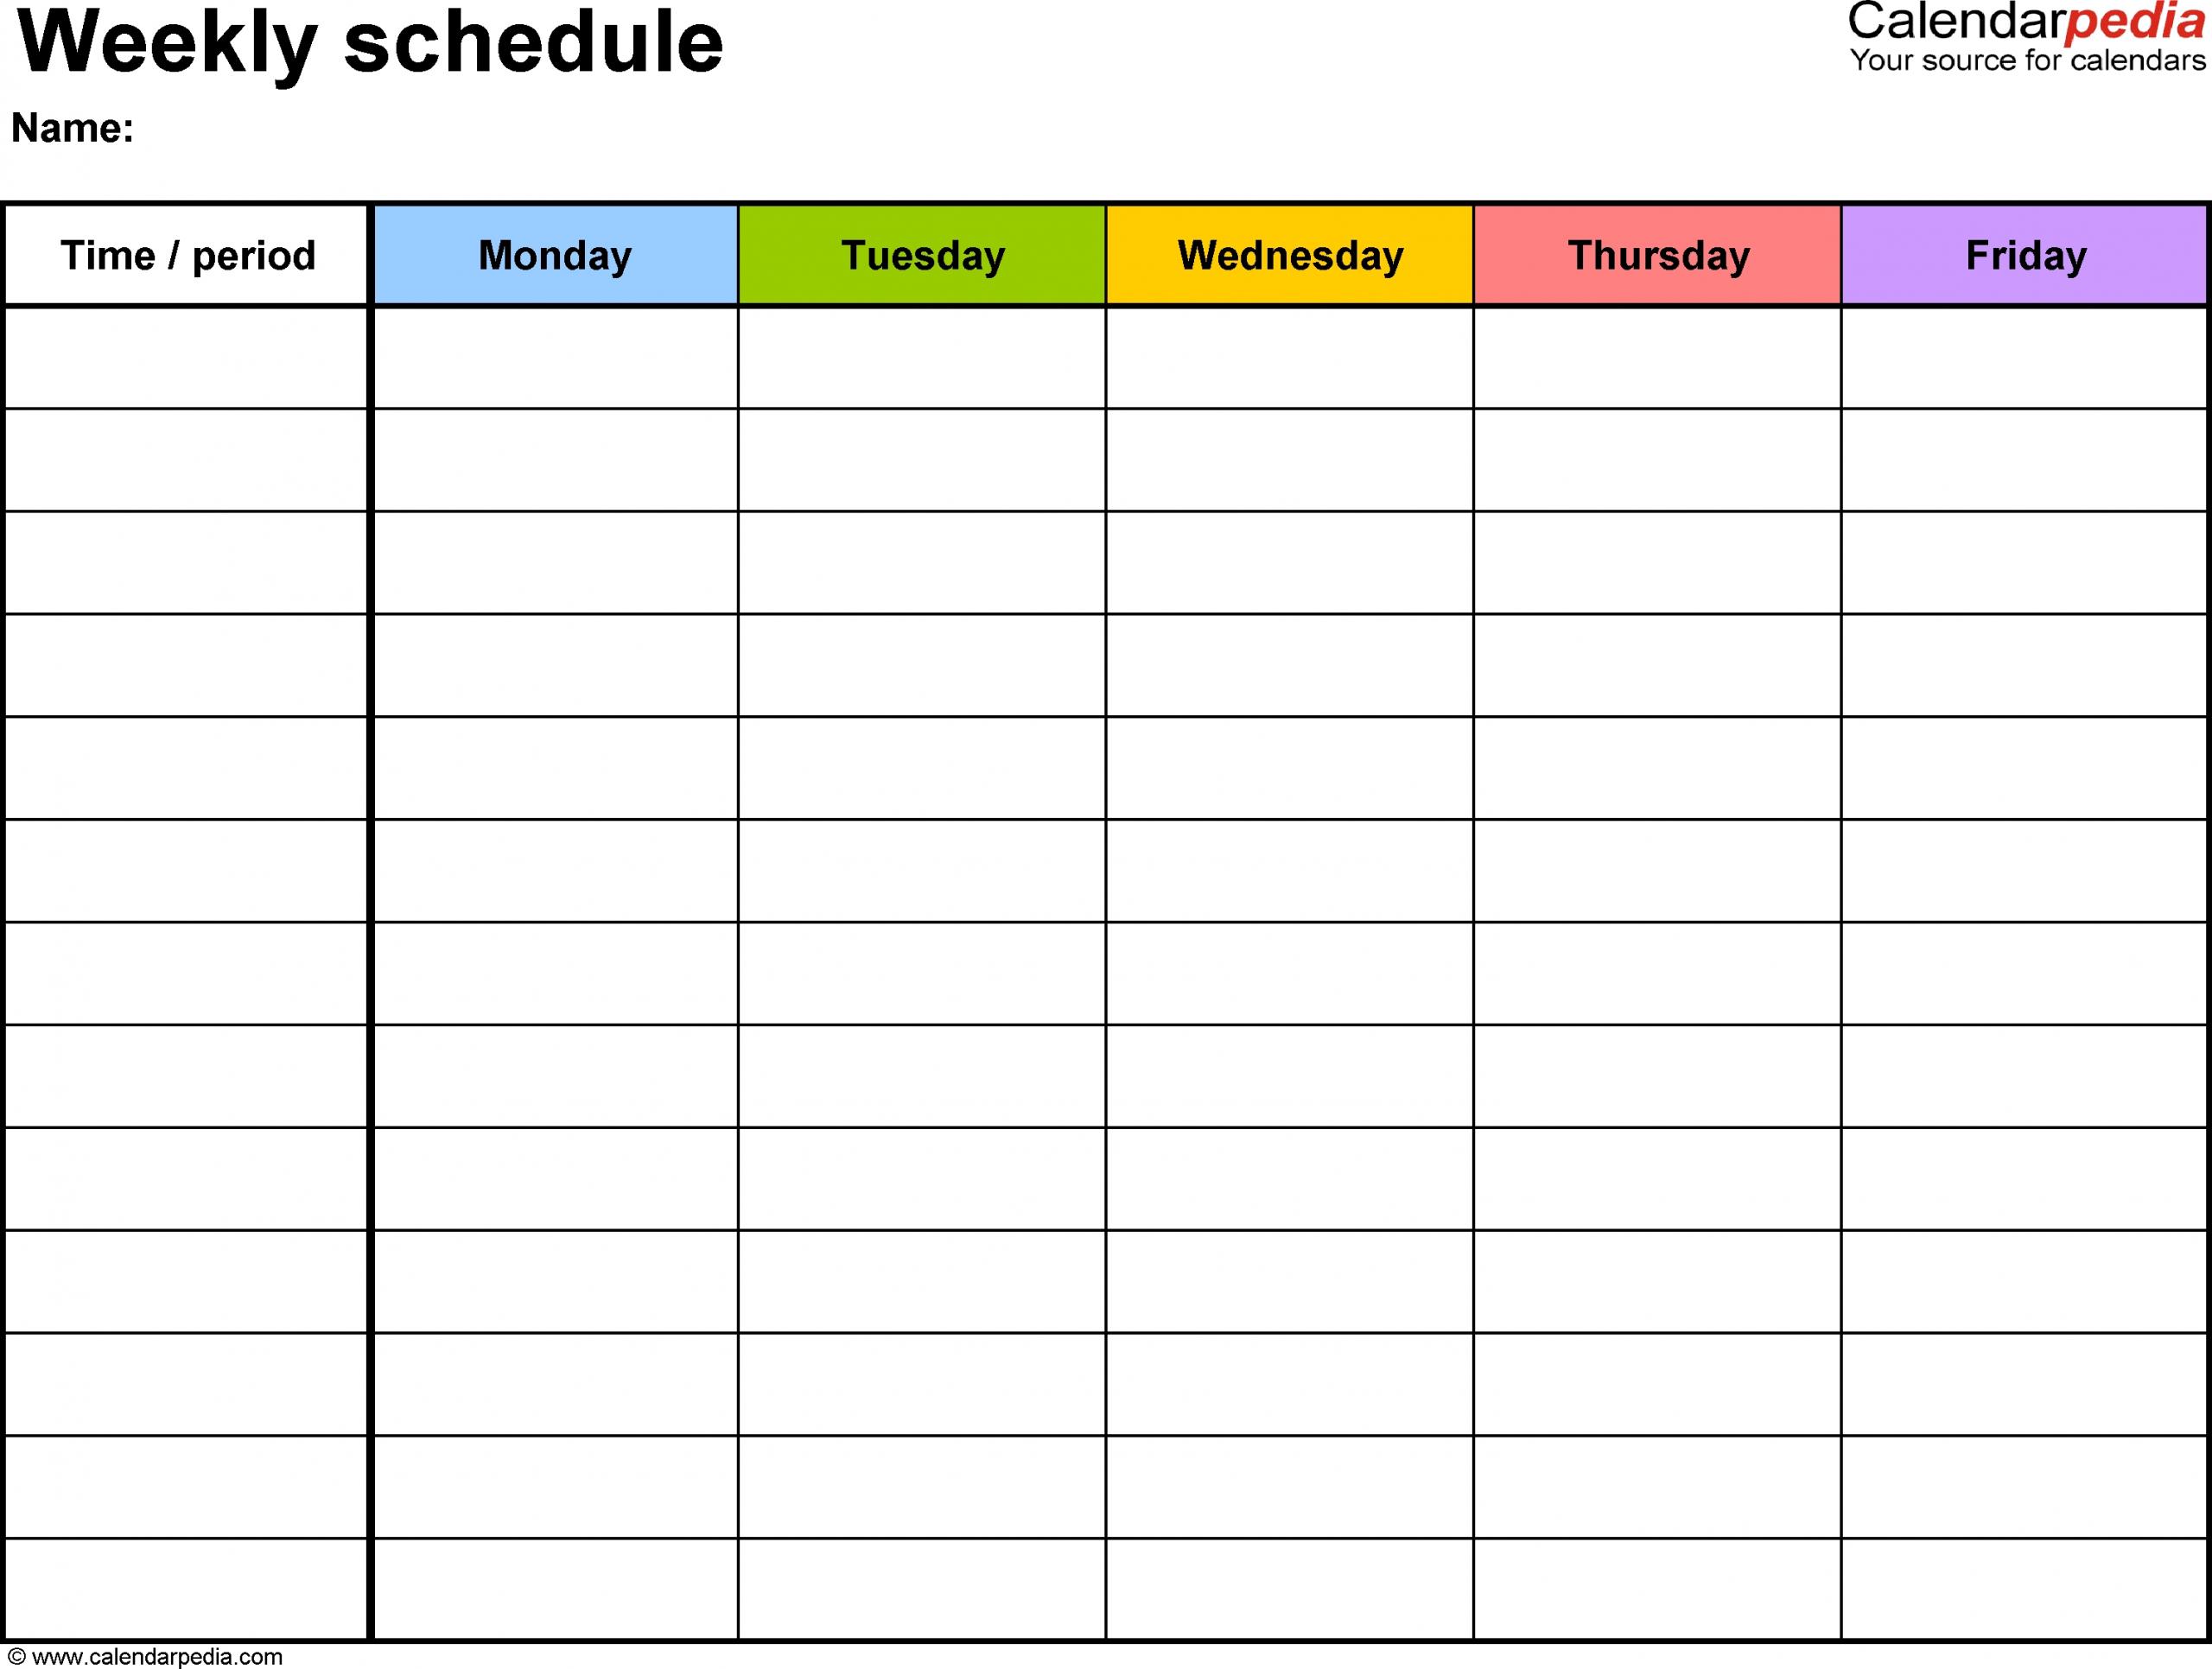 Free Calendars Monday To Sunday – Calendar Inspiration Design Monday To Sunday Calendar Template Free